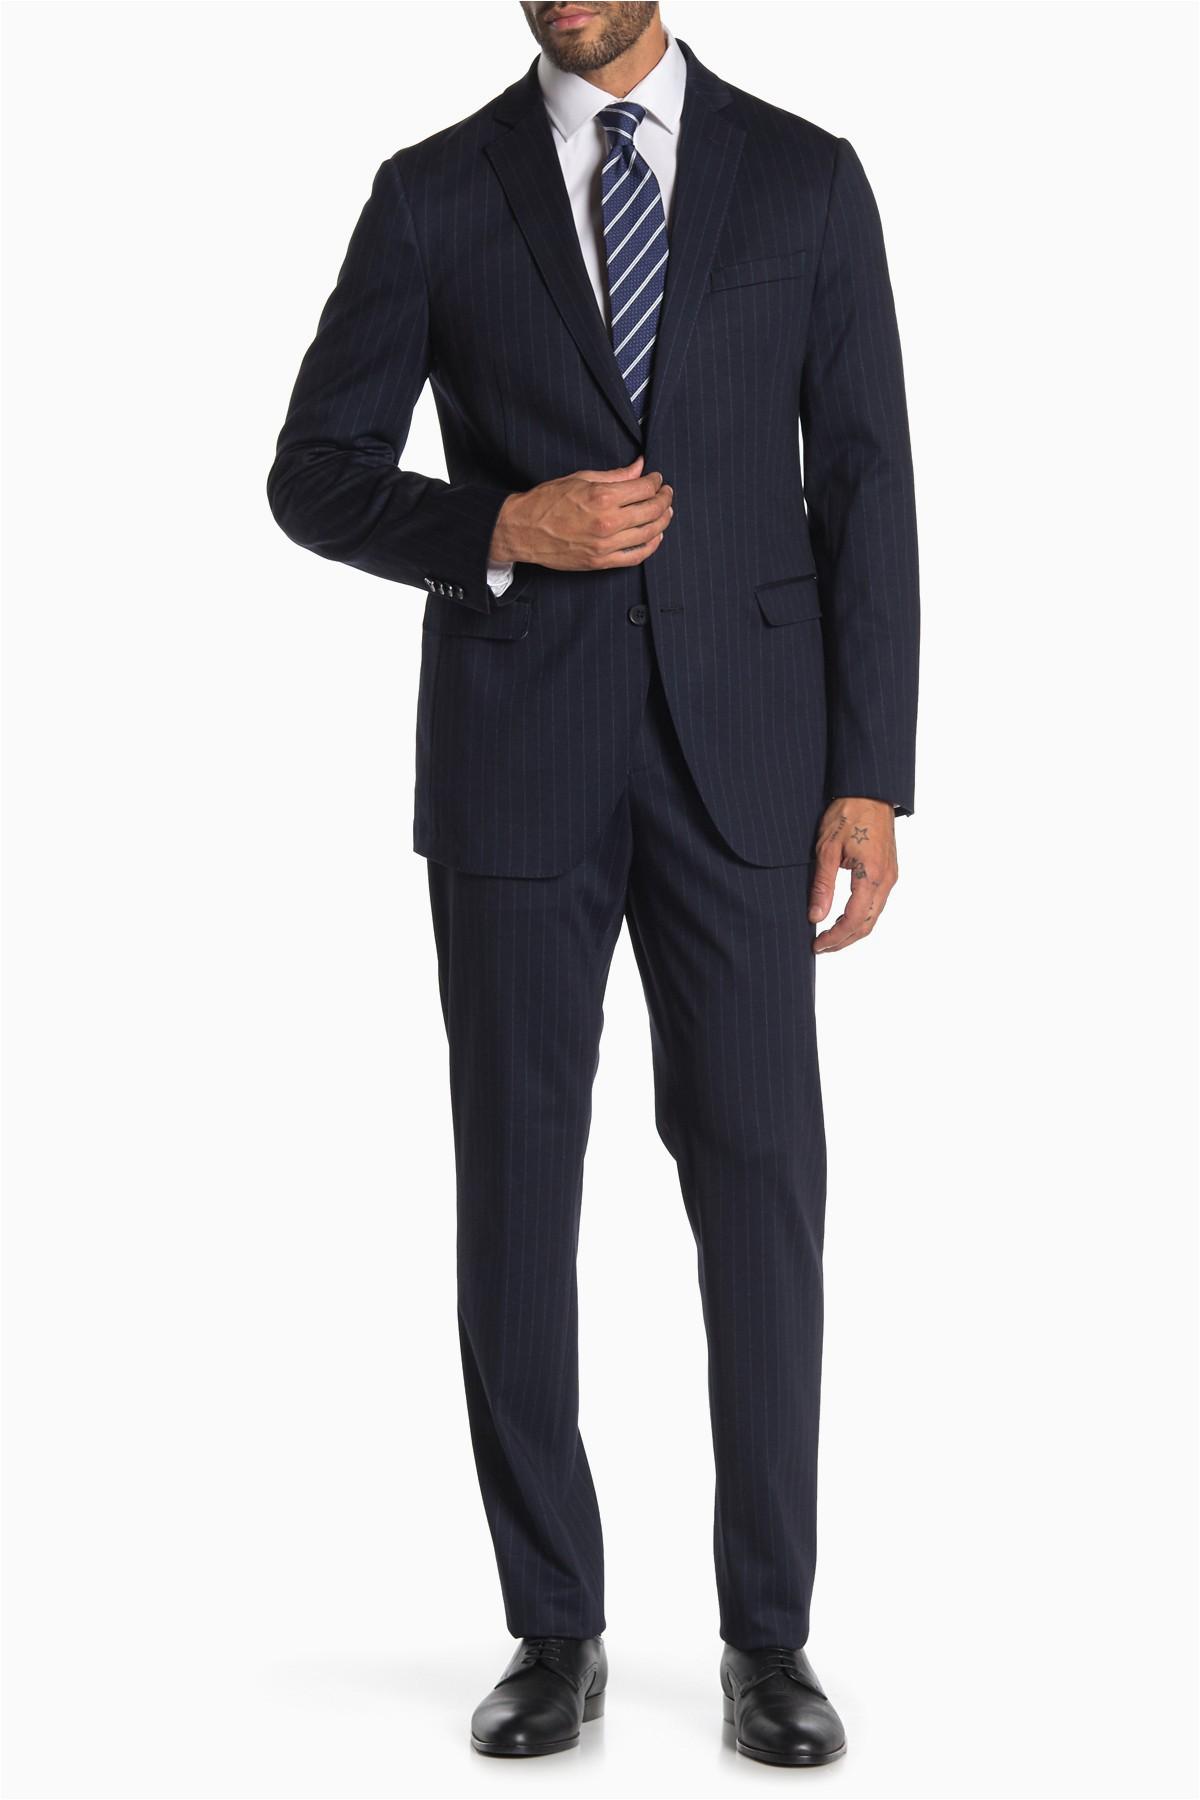 Savile Row Bath Rugs Savile Row Co Navy Pinstripe Two button Notch Lapel Knit Trim Fit Suit